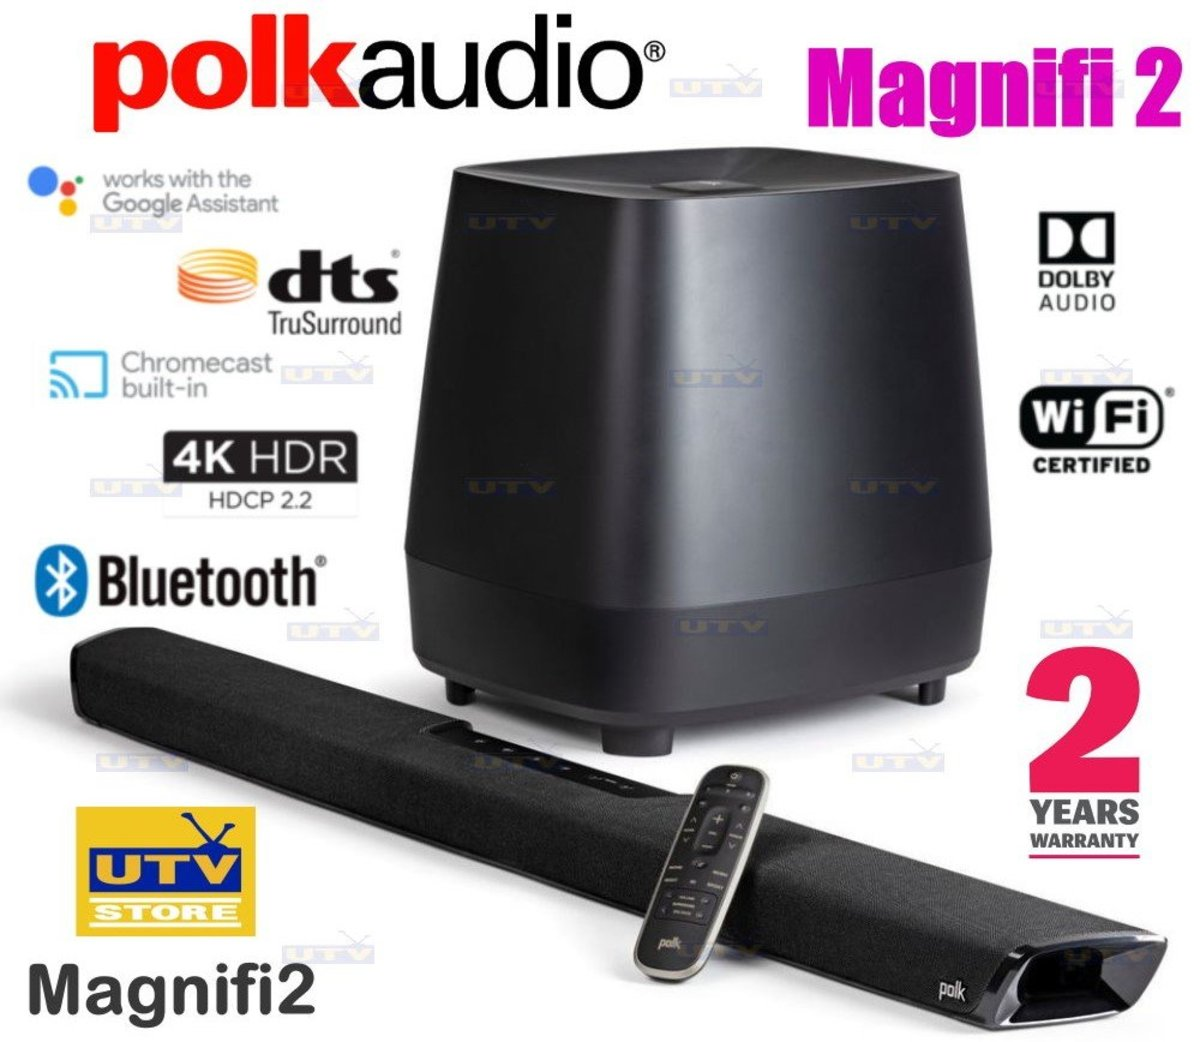 Magnifi 2 高性能條形音箱系統